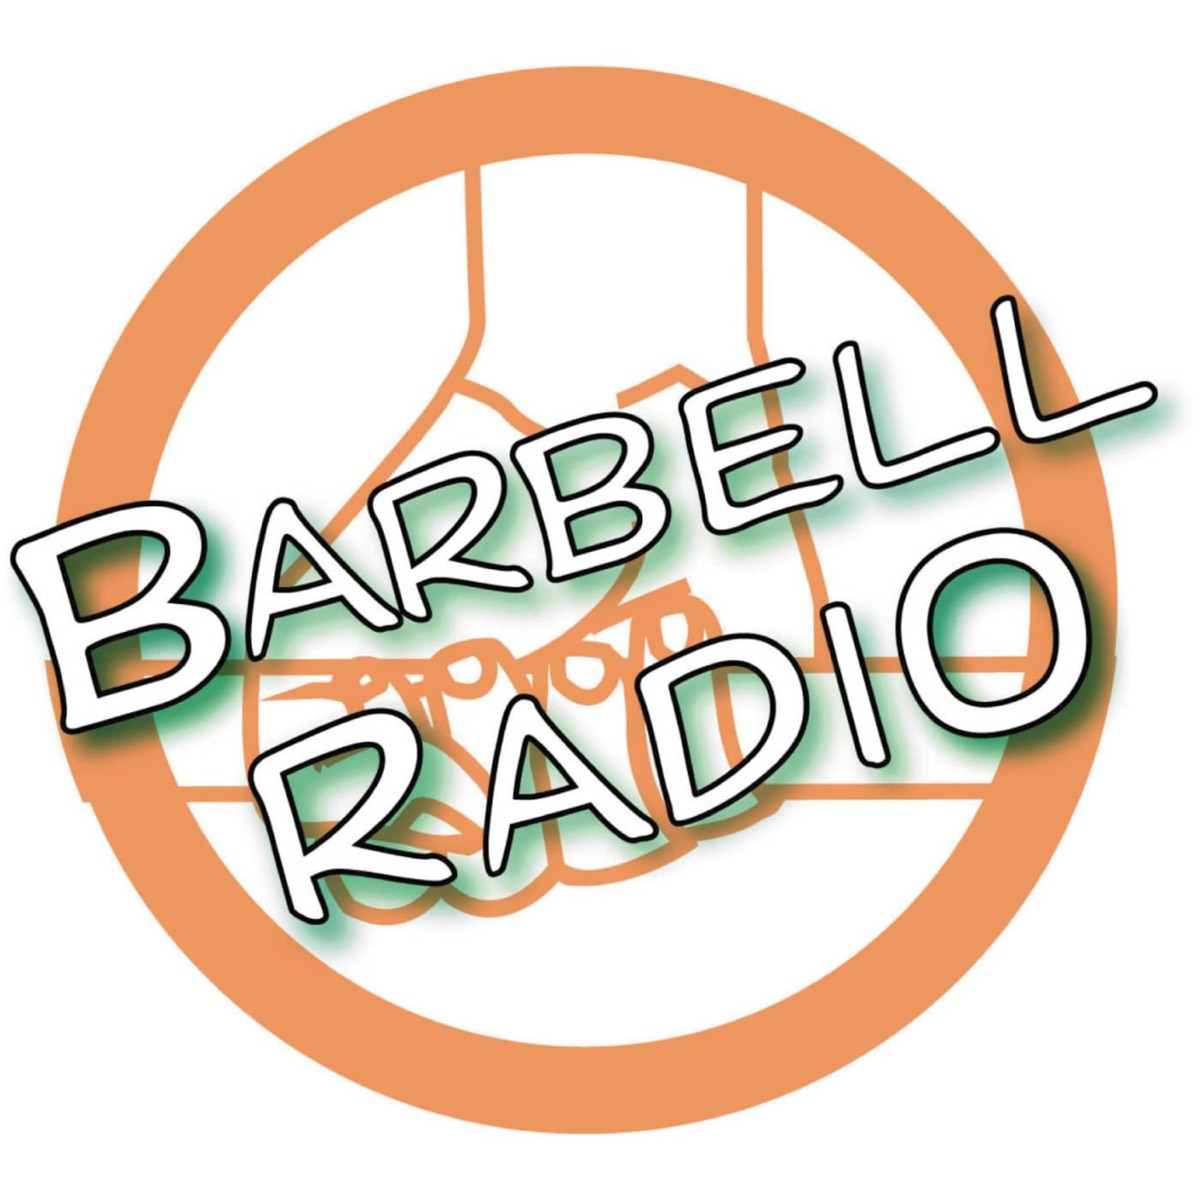 Barbell Radio